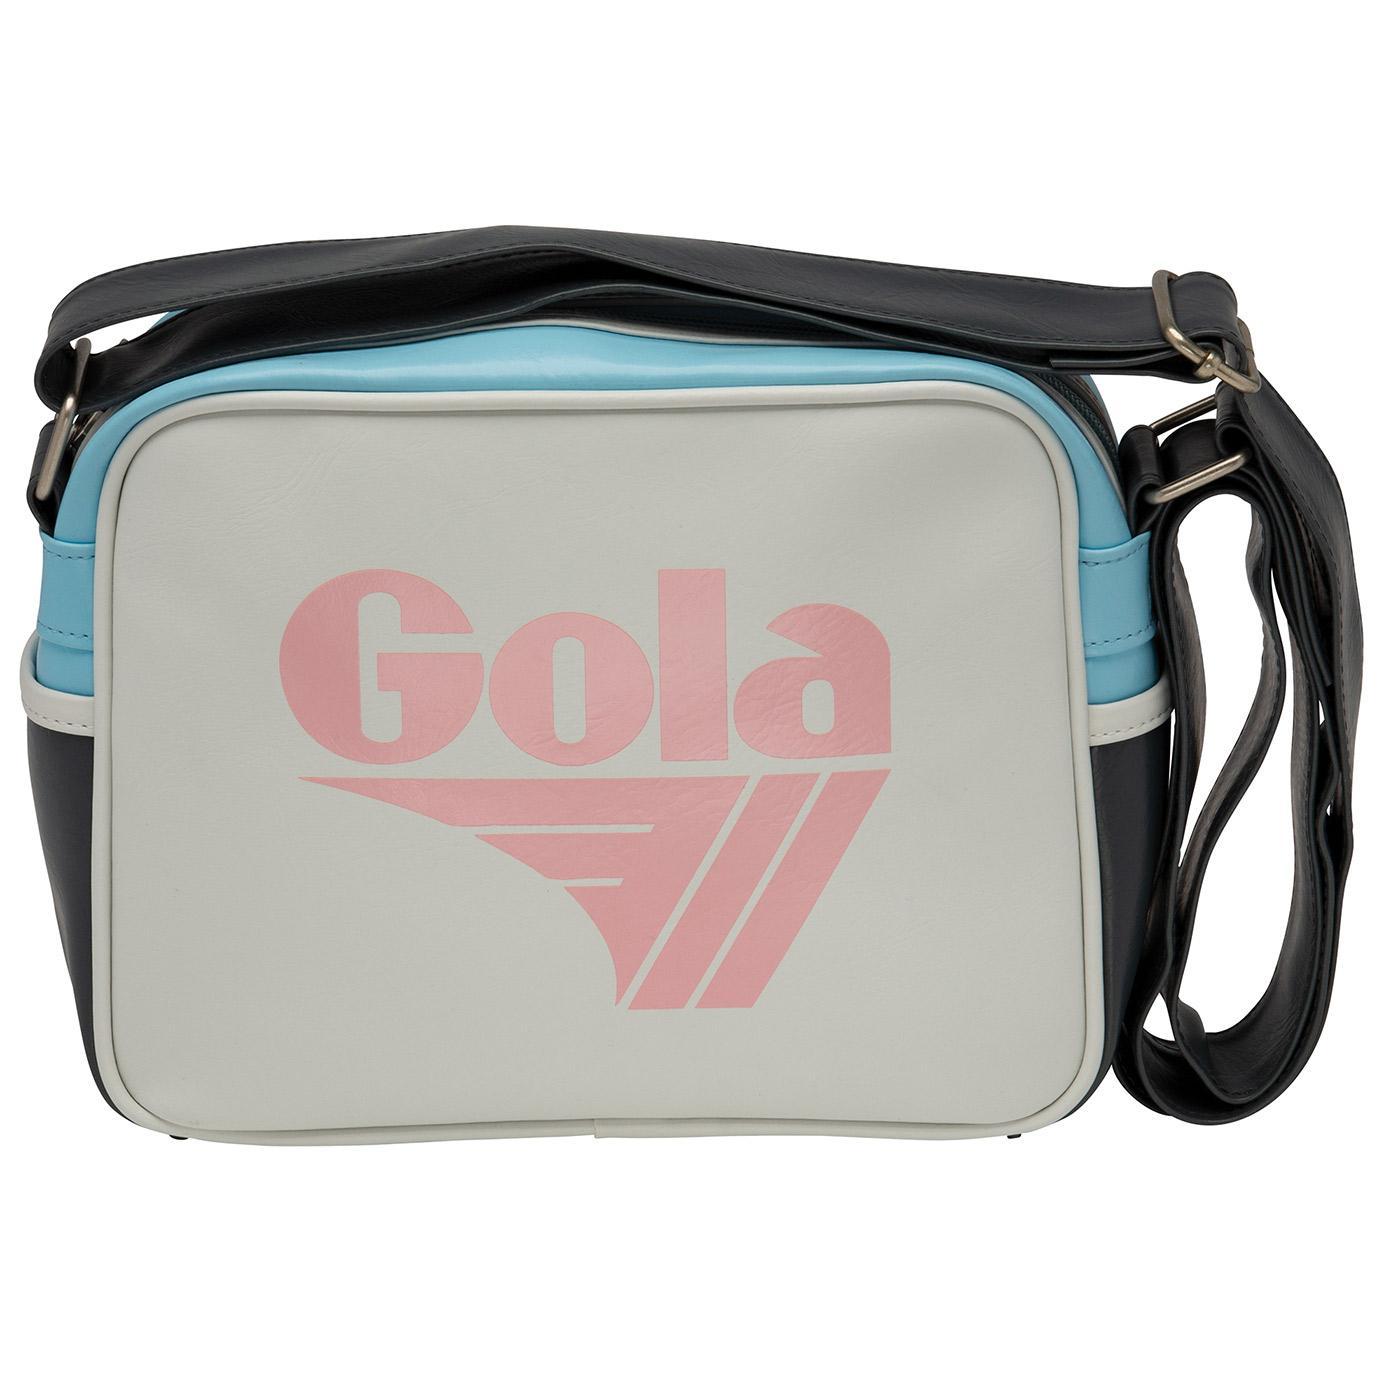 GOLA Micro Redford Retro Shoulder Bag (White/Pink)